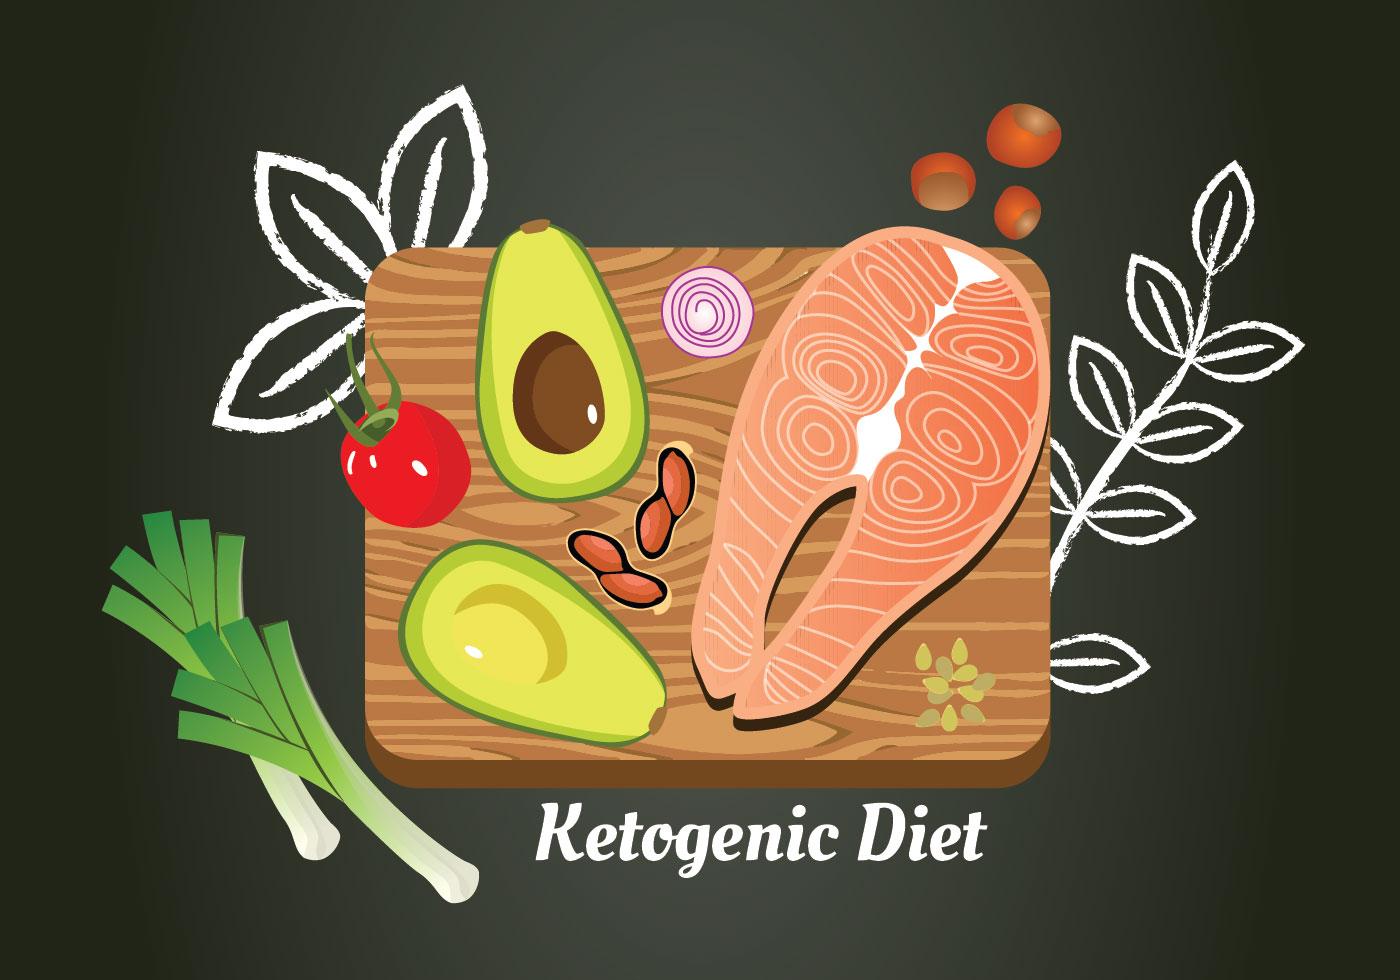 Ketogenic Diet Vector Design - Download Free Vector Art, Stock Graphics & Images